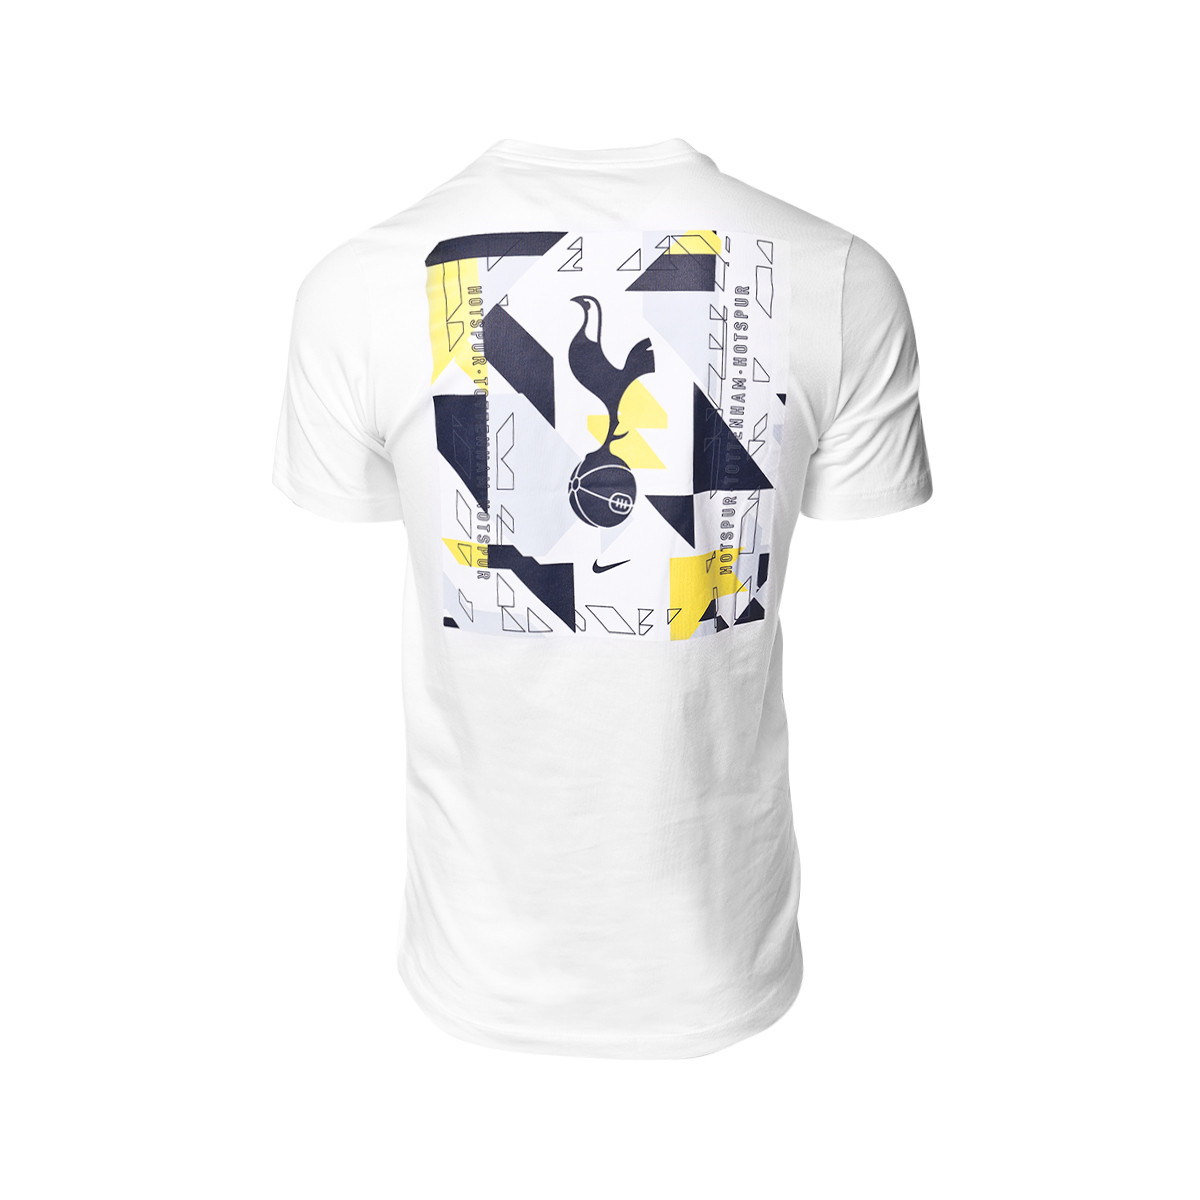 Jersey Nike Tottenham Hotspur Fc Tee Voice 2020 2021 White Football Store Futbol Emotion